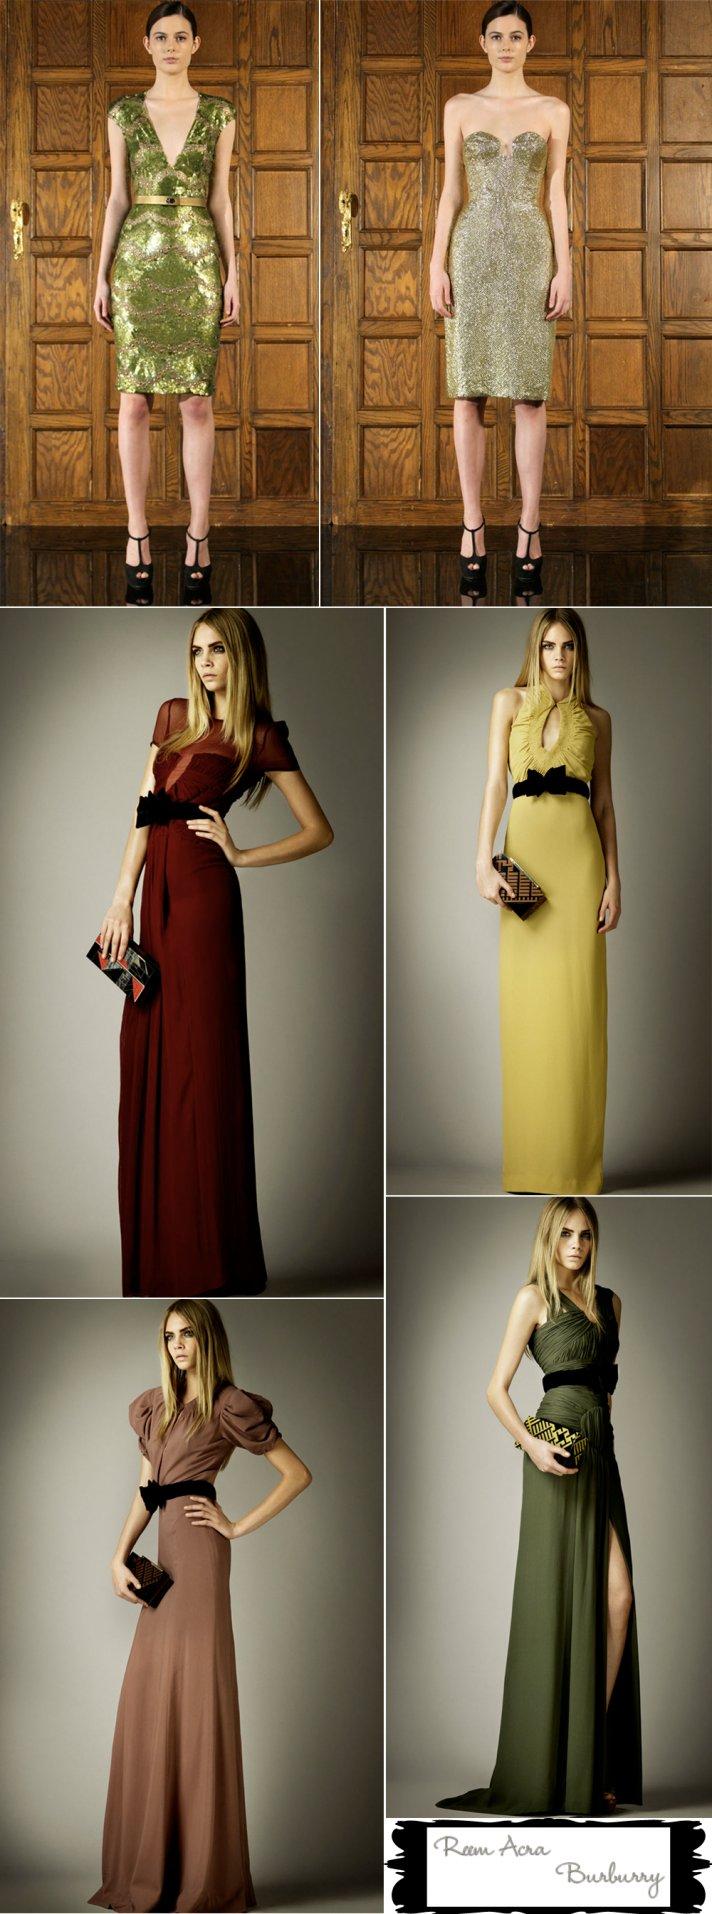 Gold, green bridesmaids dress inspiration for fall weddings